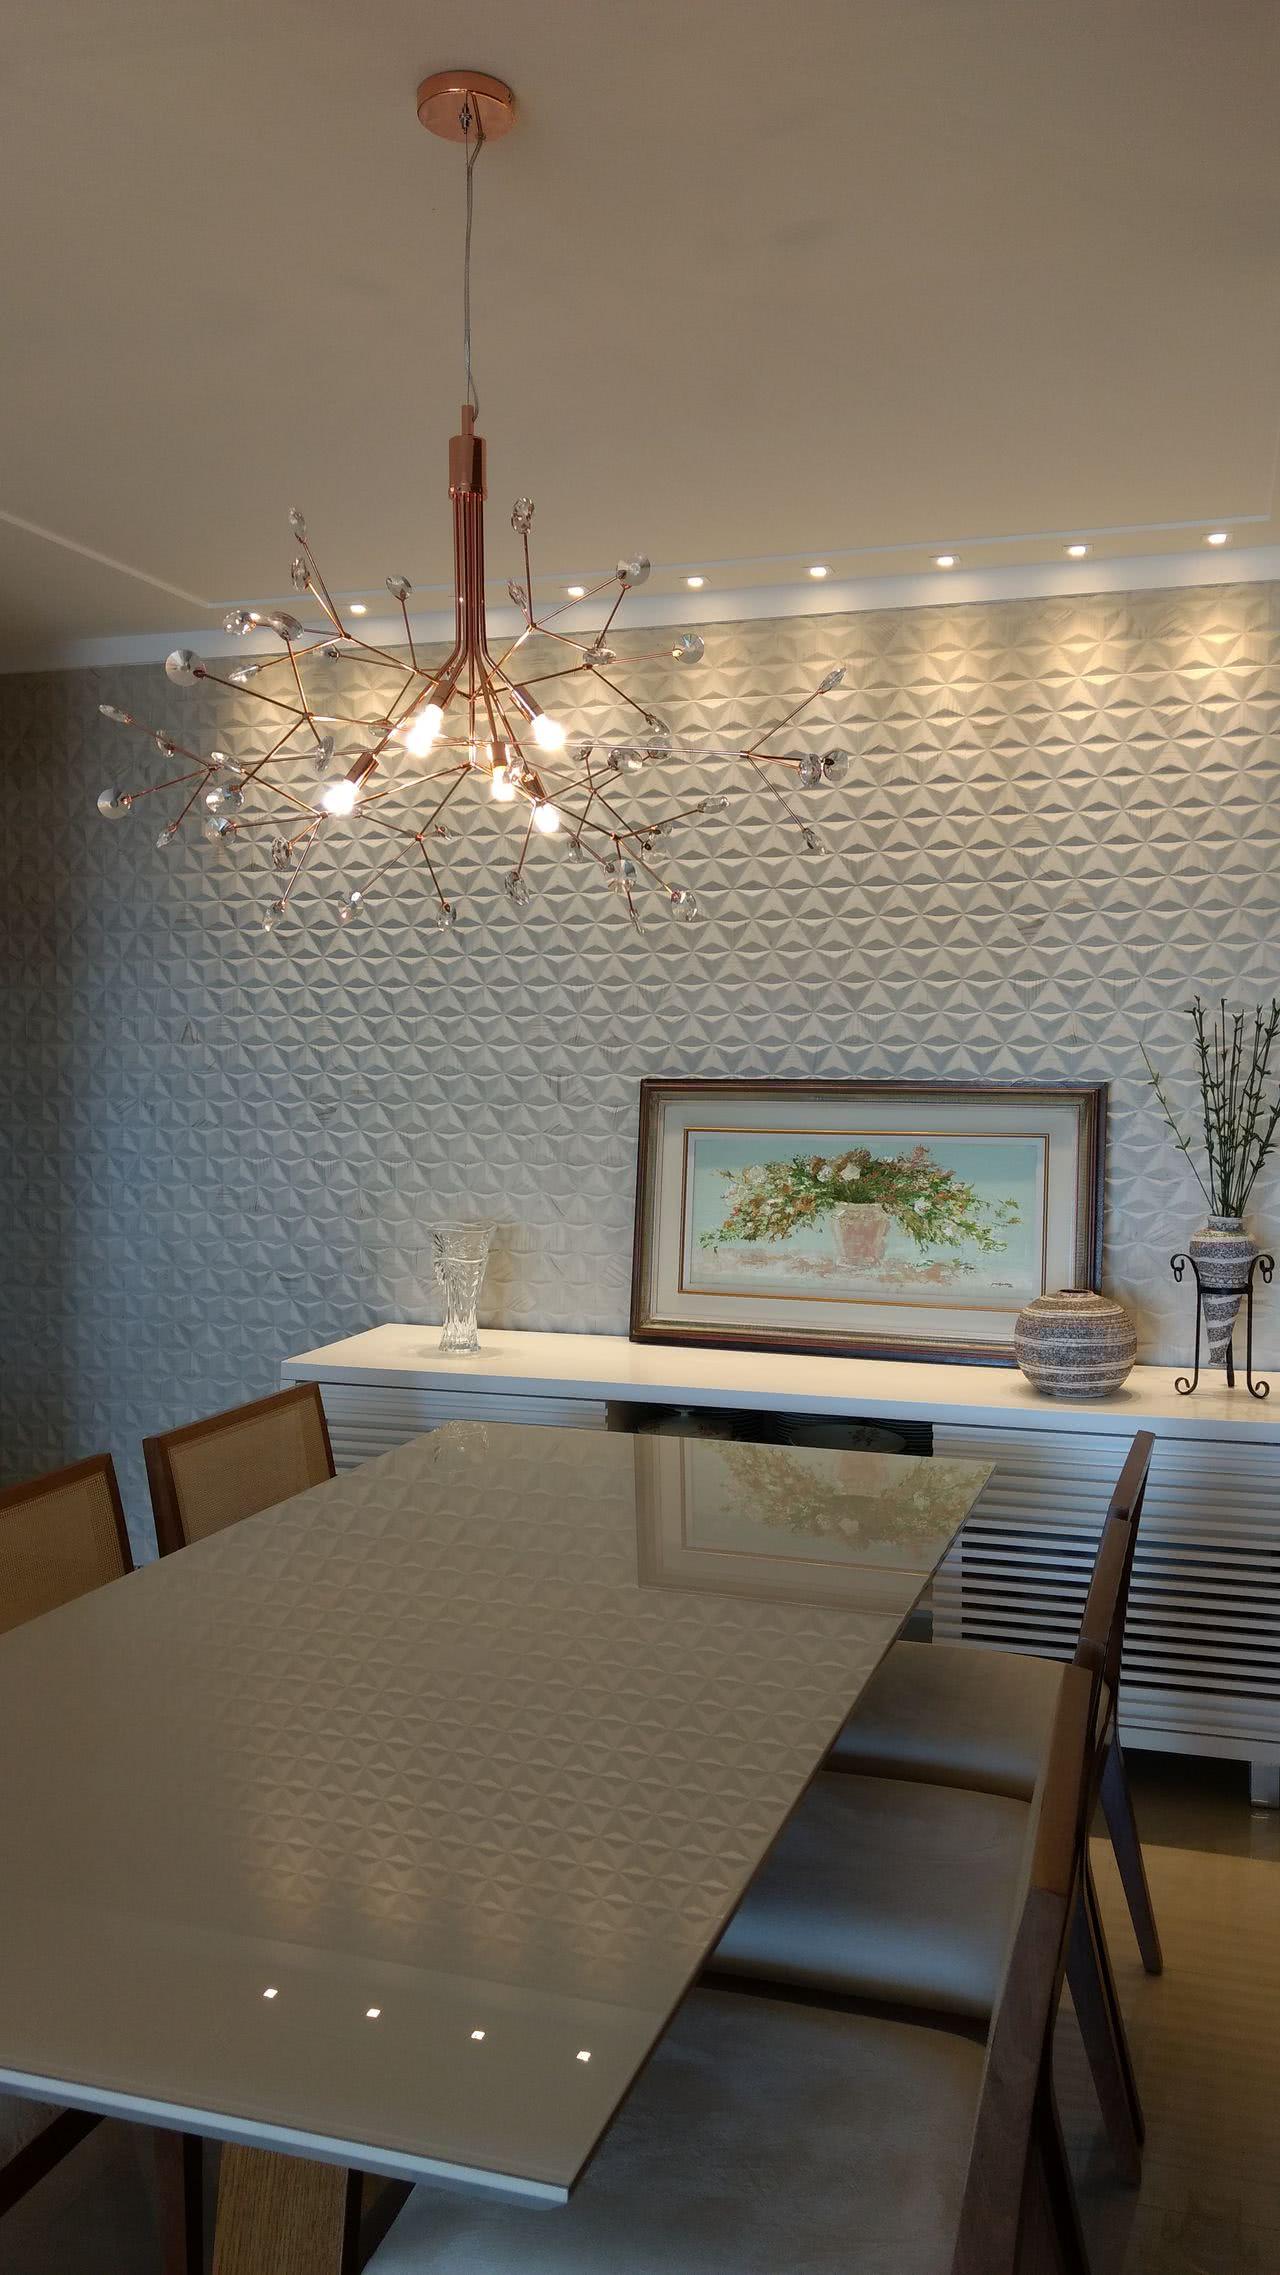 Tipos De Lustres Para Sala Para Sala De Jantar With Tipos De  -> Lustres Chiques Para Sala De Jantar